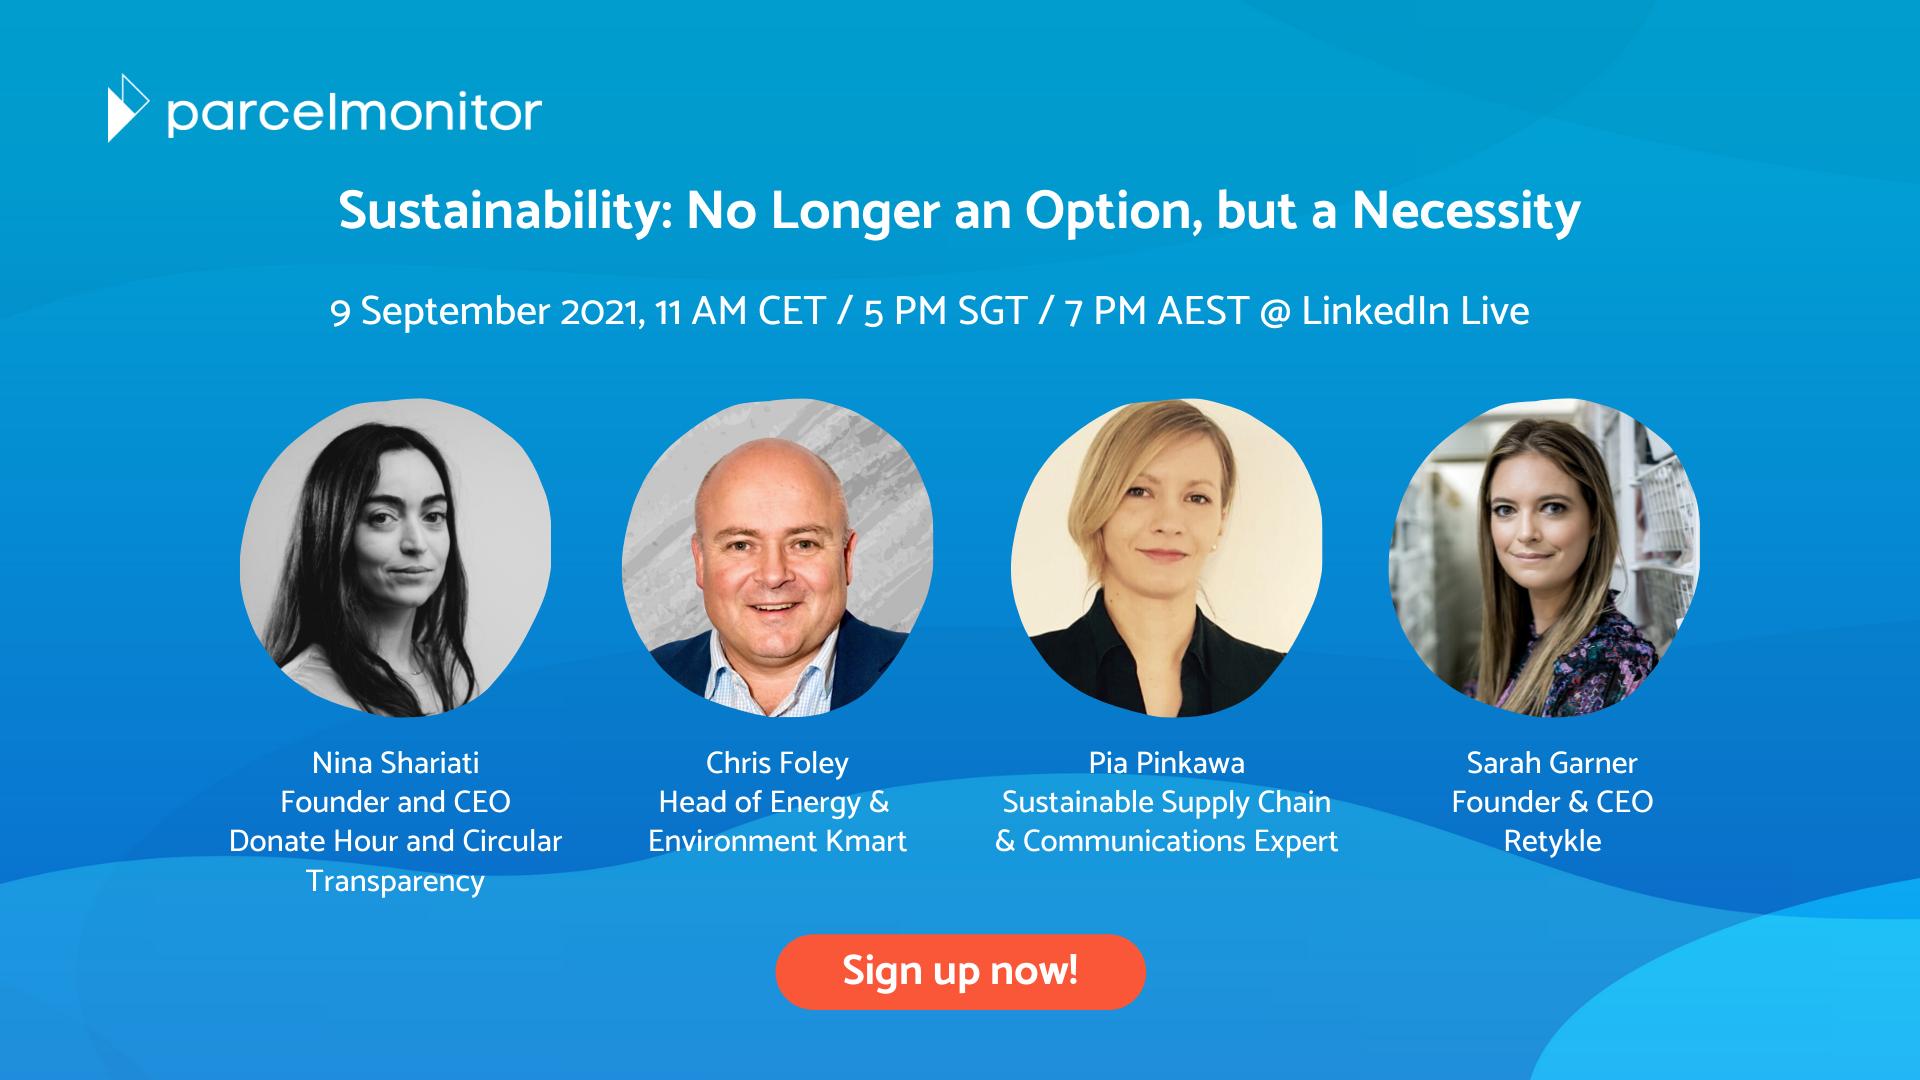 Sustainability Webinar - Parcel Monitor